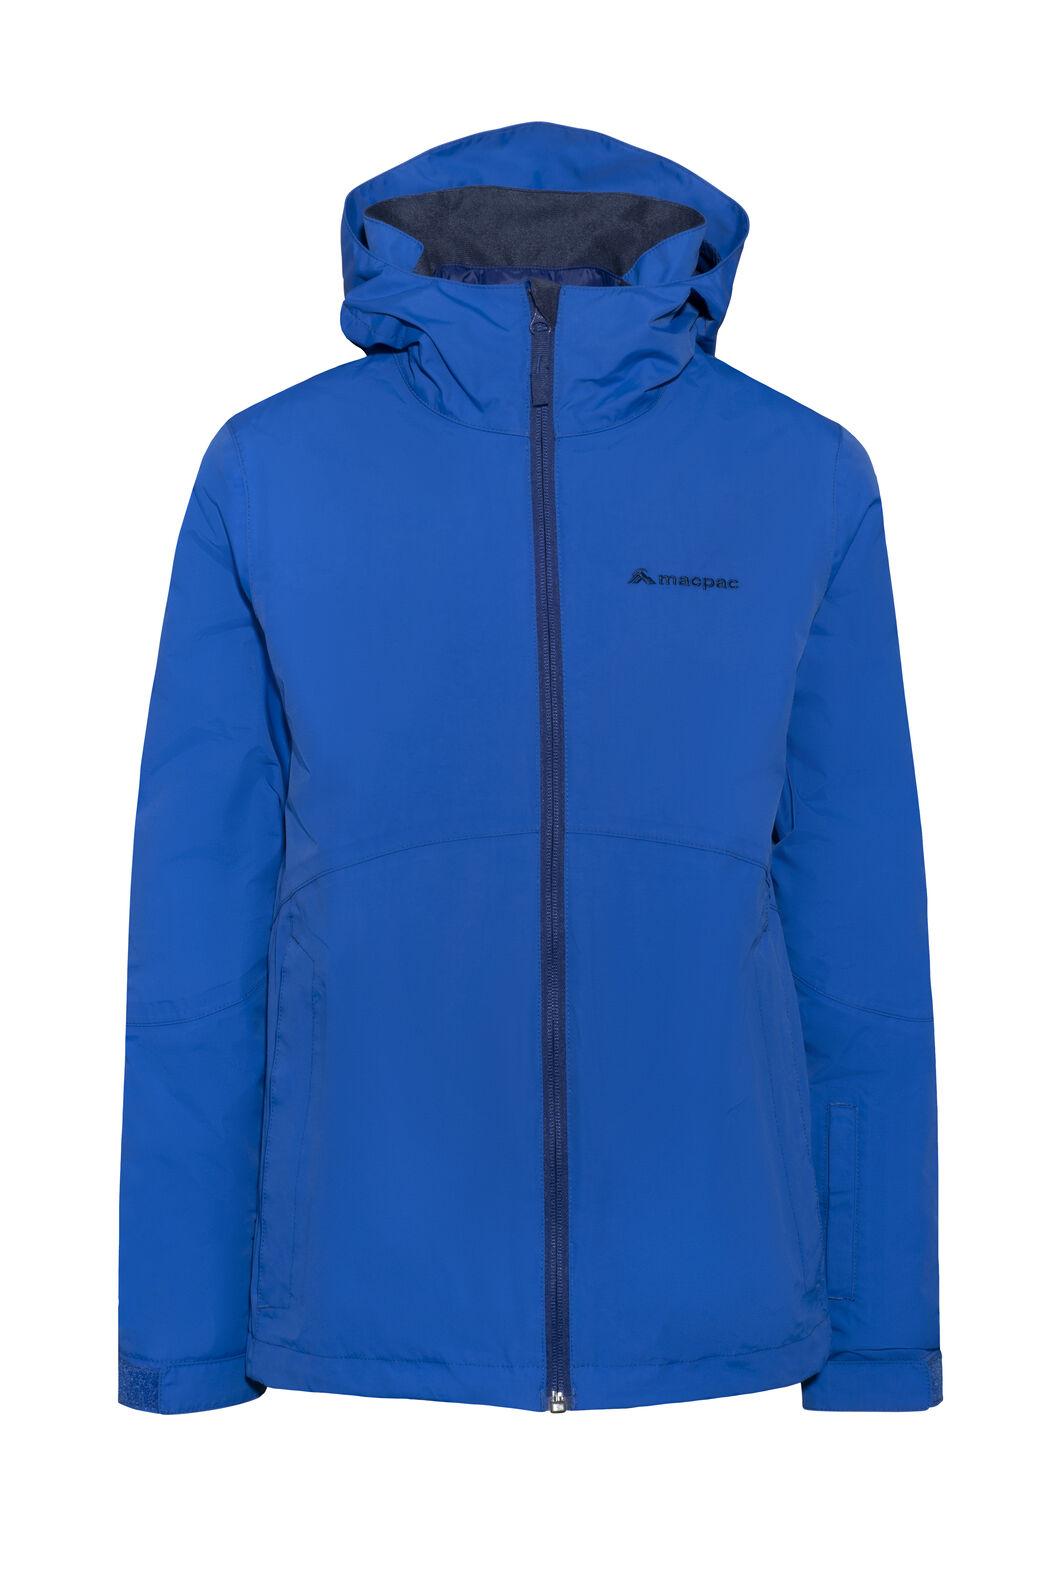 Macpac Snowdrift 3-in-1 Snow Jacket — Kids', Nautical Blue, hi-res